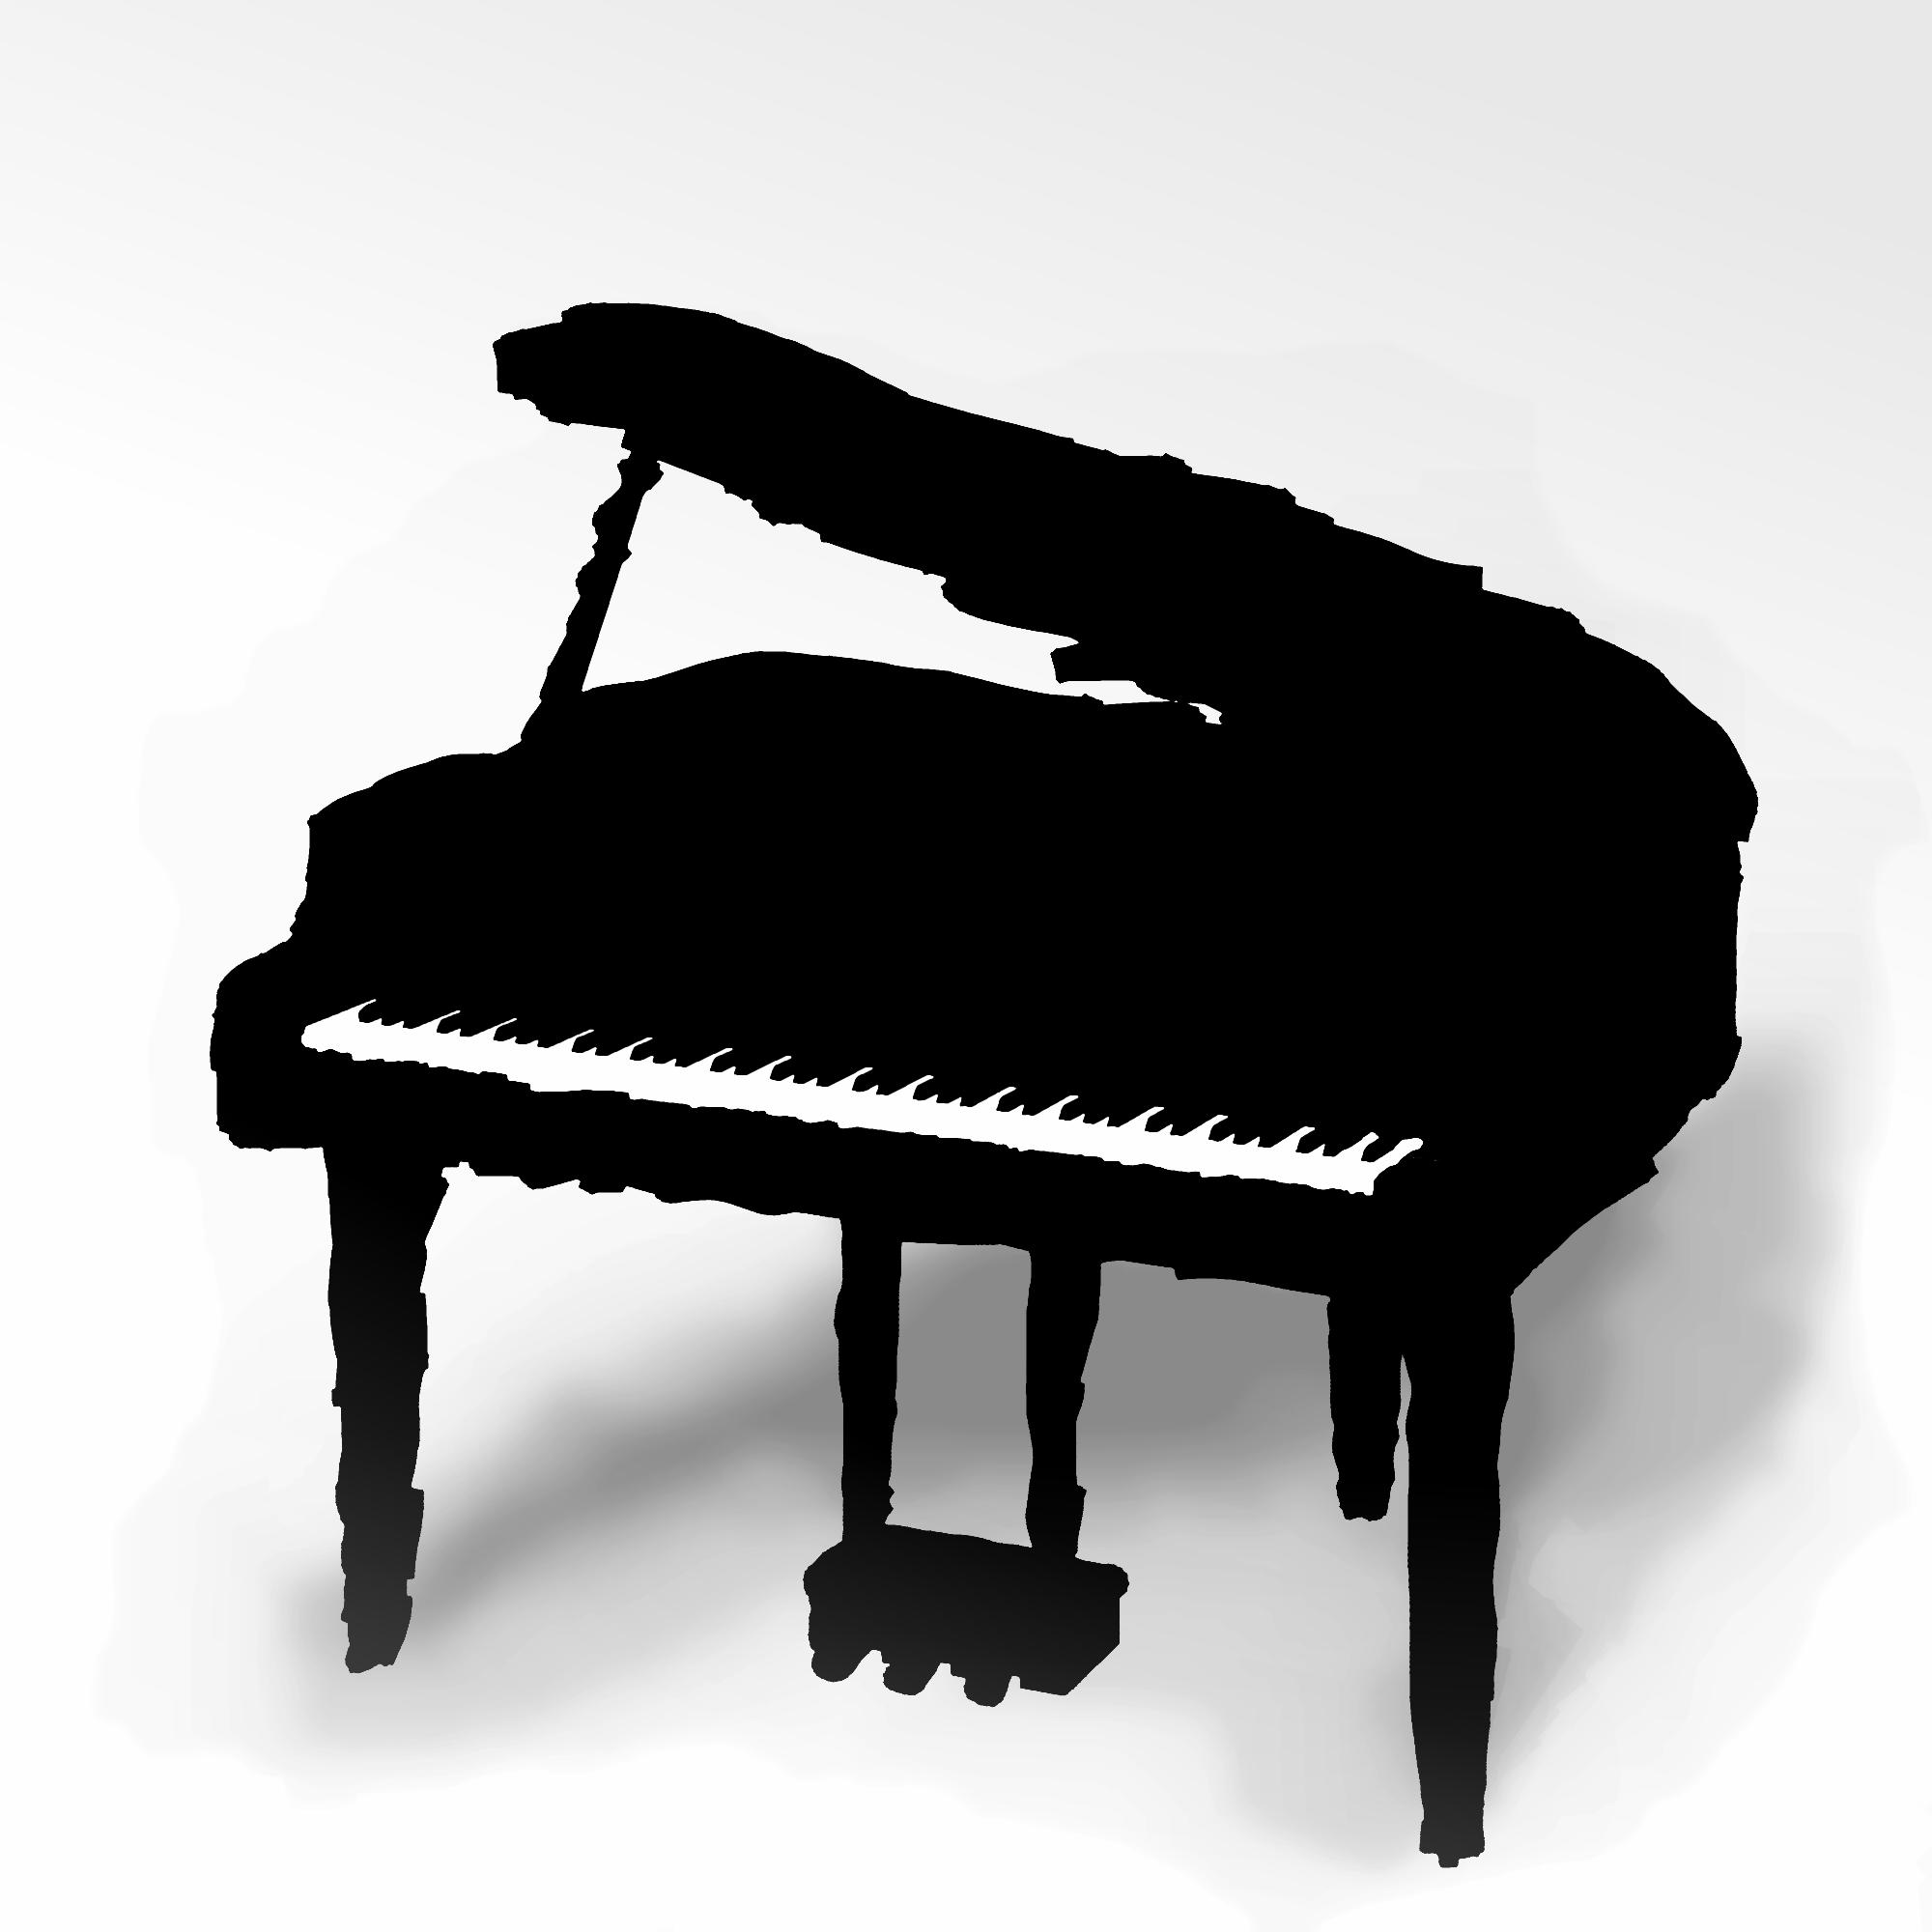 fortepian.png